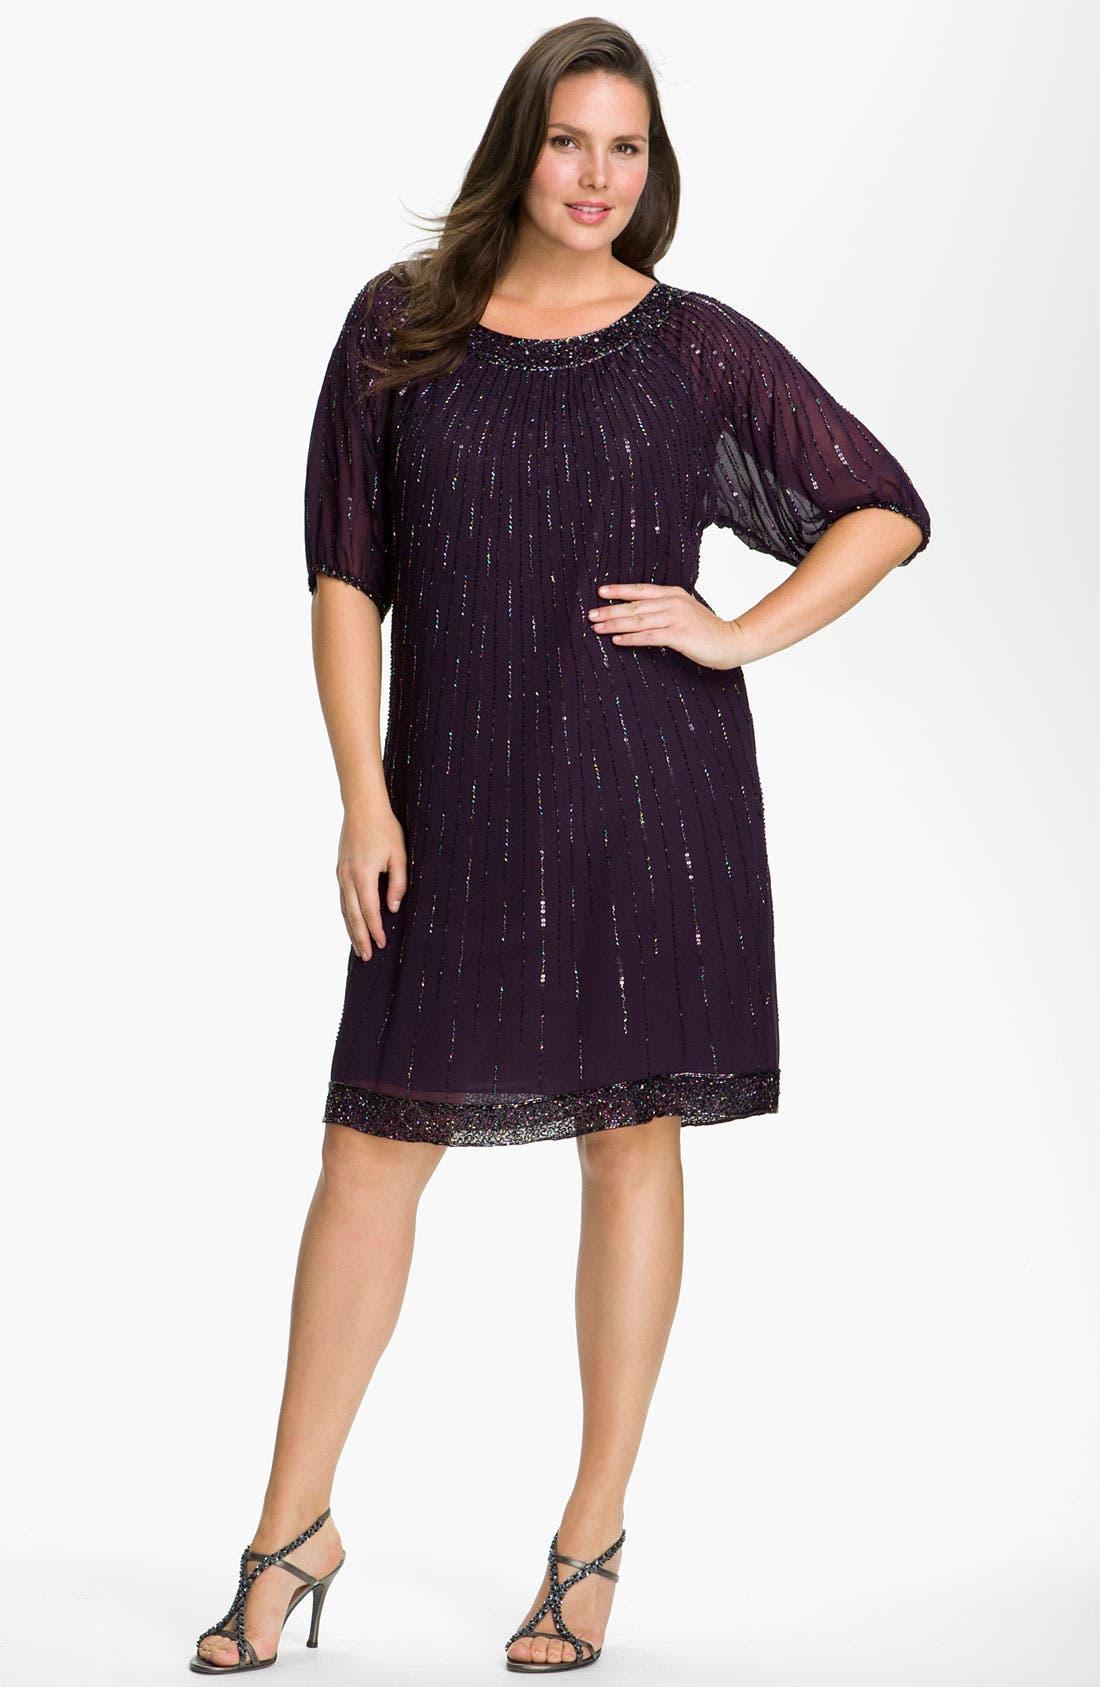 Alternate Image 1 Selected - J Kara Sequin Chiffon Shift Dress (Plus Size)